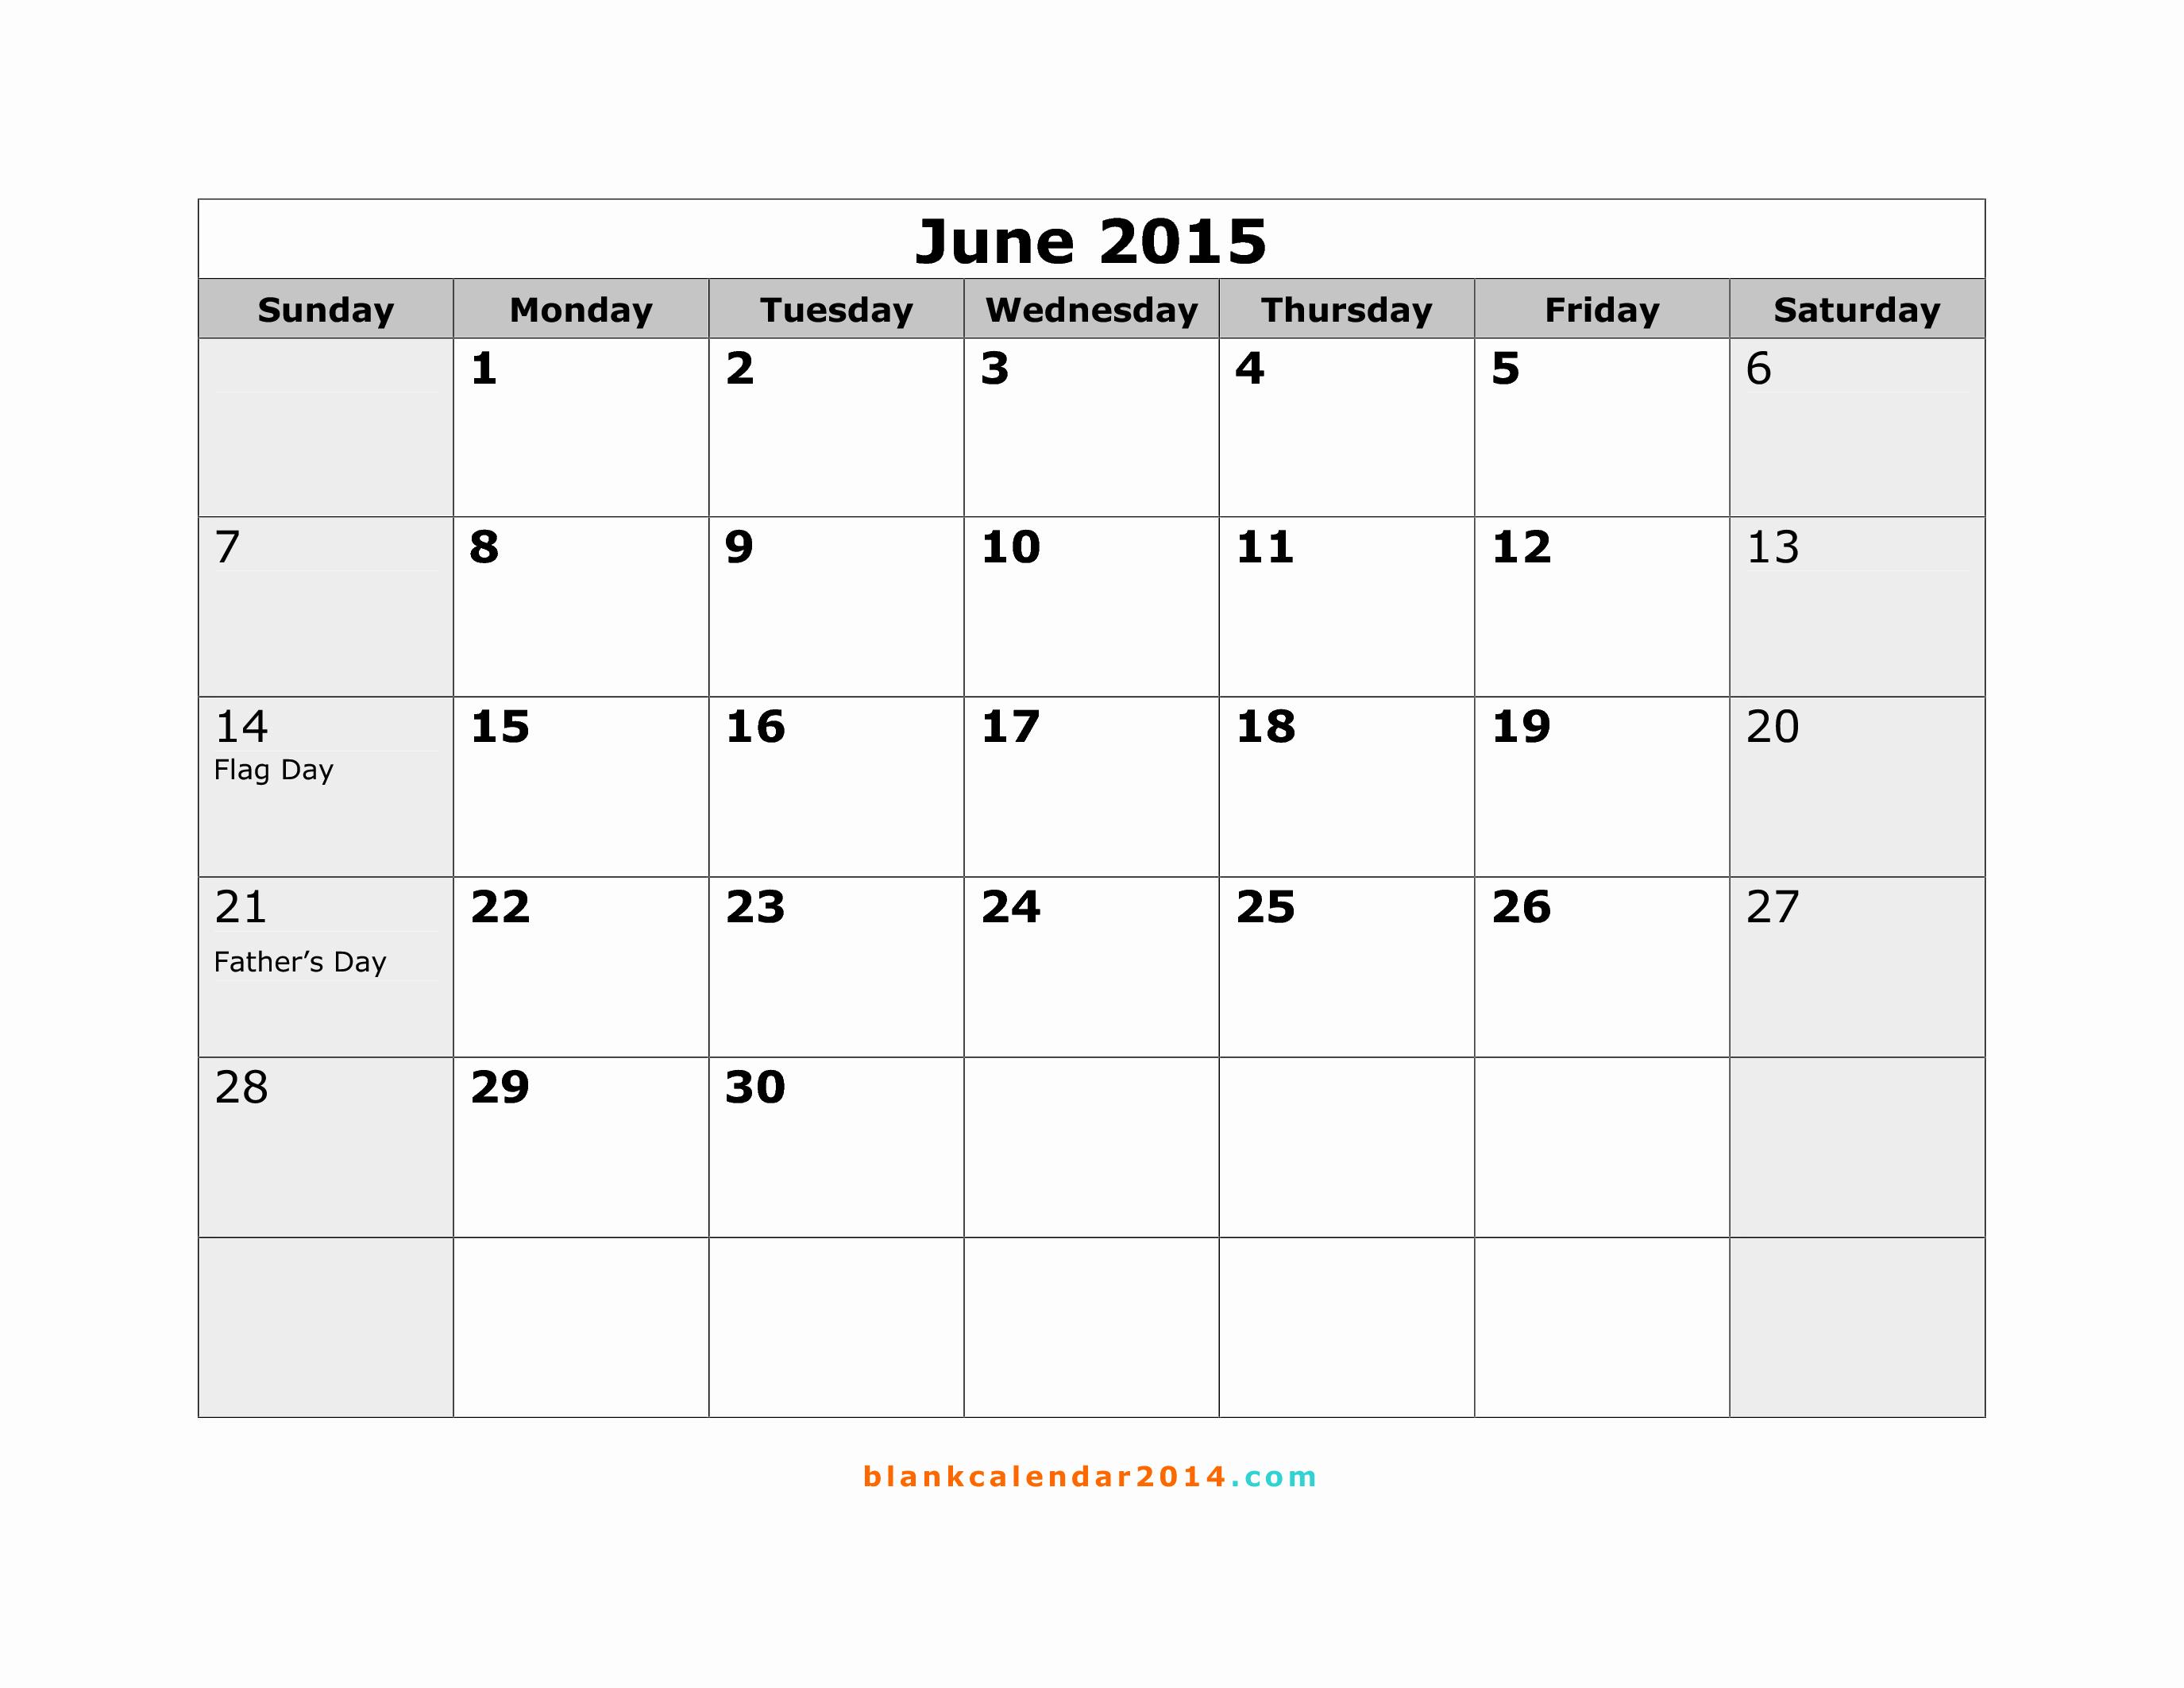 Calendar Template for June 2015 New 6 Best Of June Calendar Printable April 2015